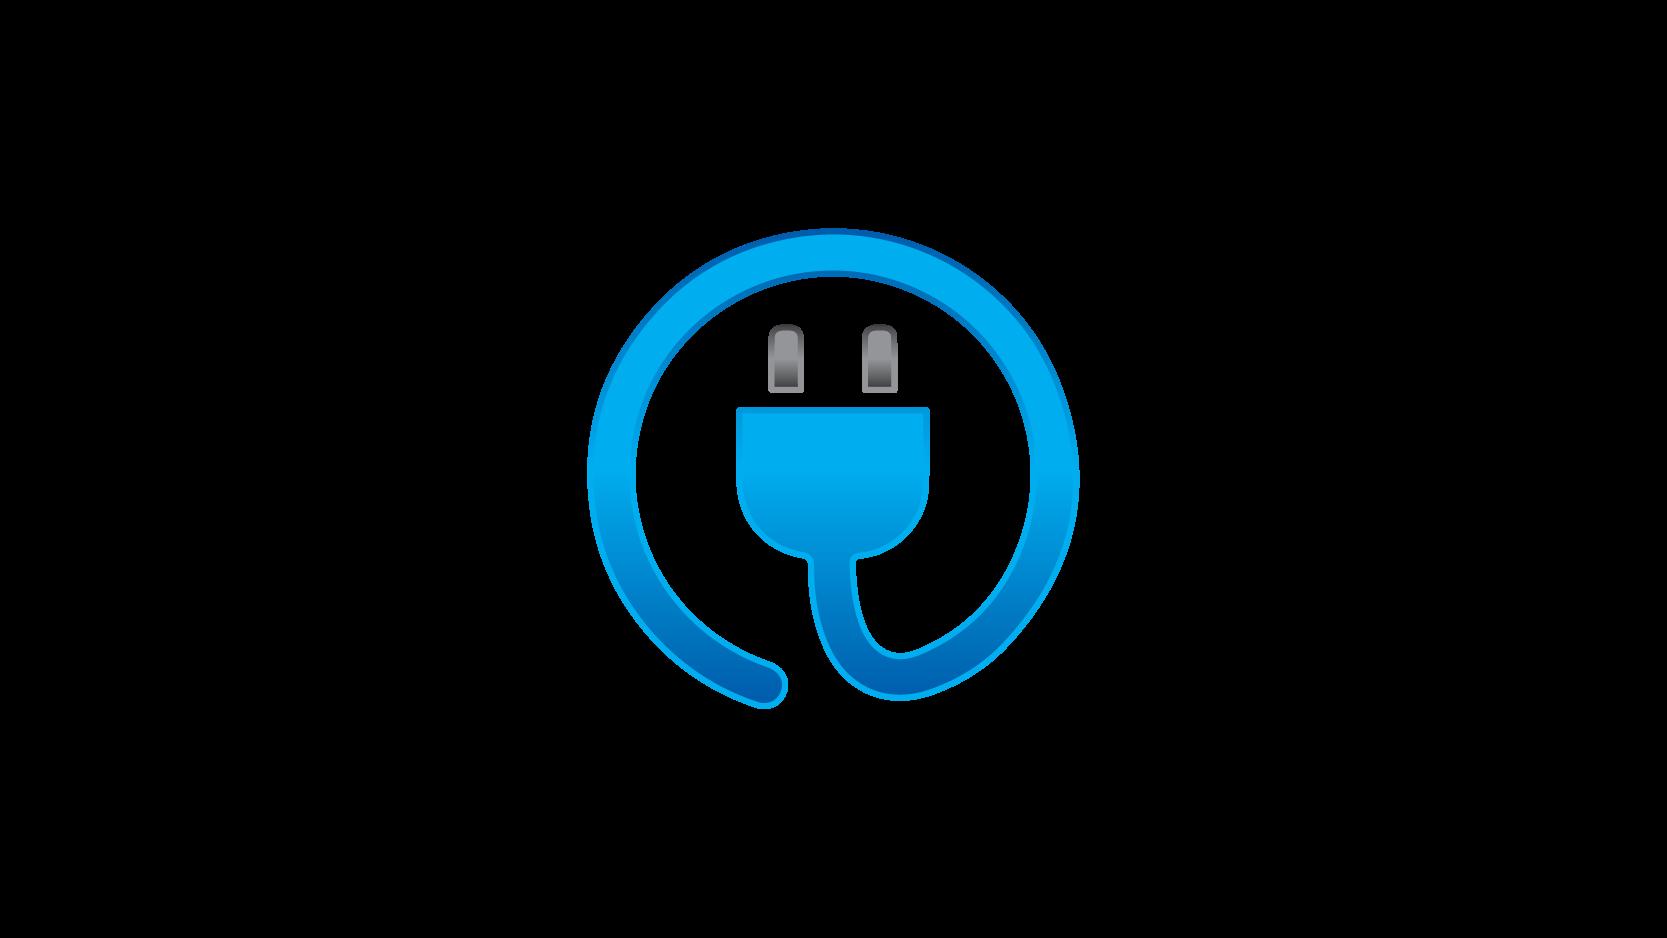 fk-oluk-infinityfuturelivingicons2ndrev-separated_plugpng